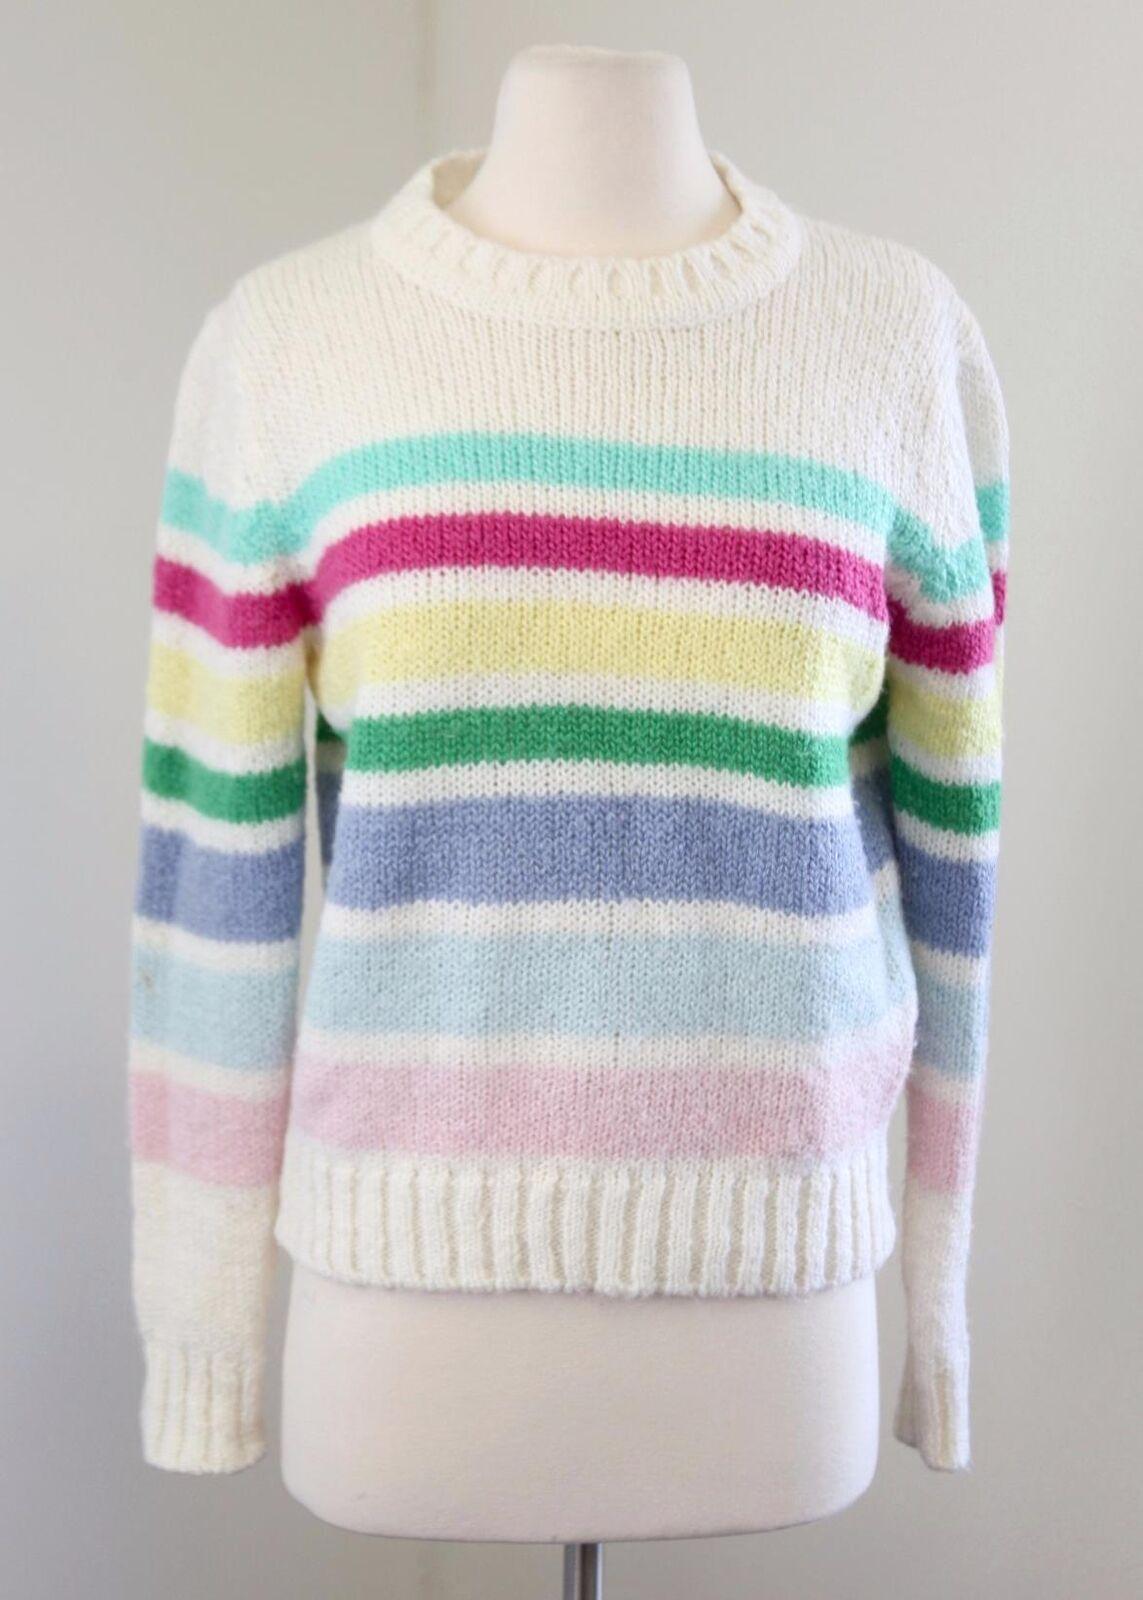 Vtg Pastel Rainbow Striped Acrylic Sweater Size 40 - S   M Hong Kong Retro Rave